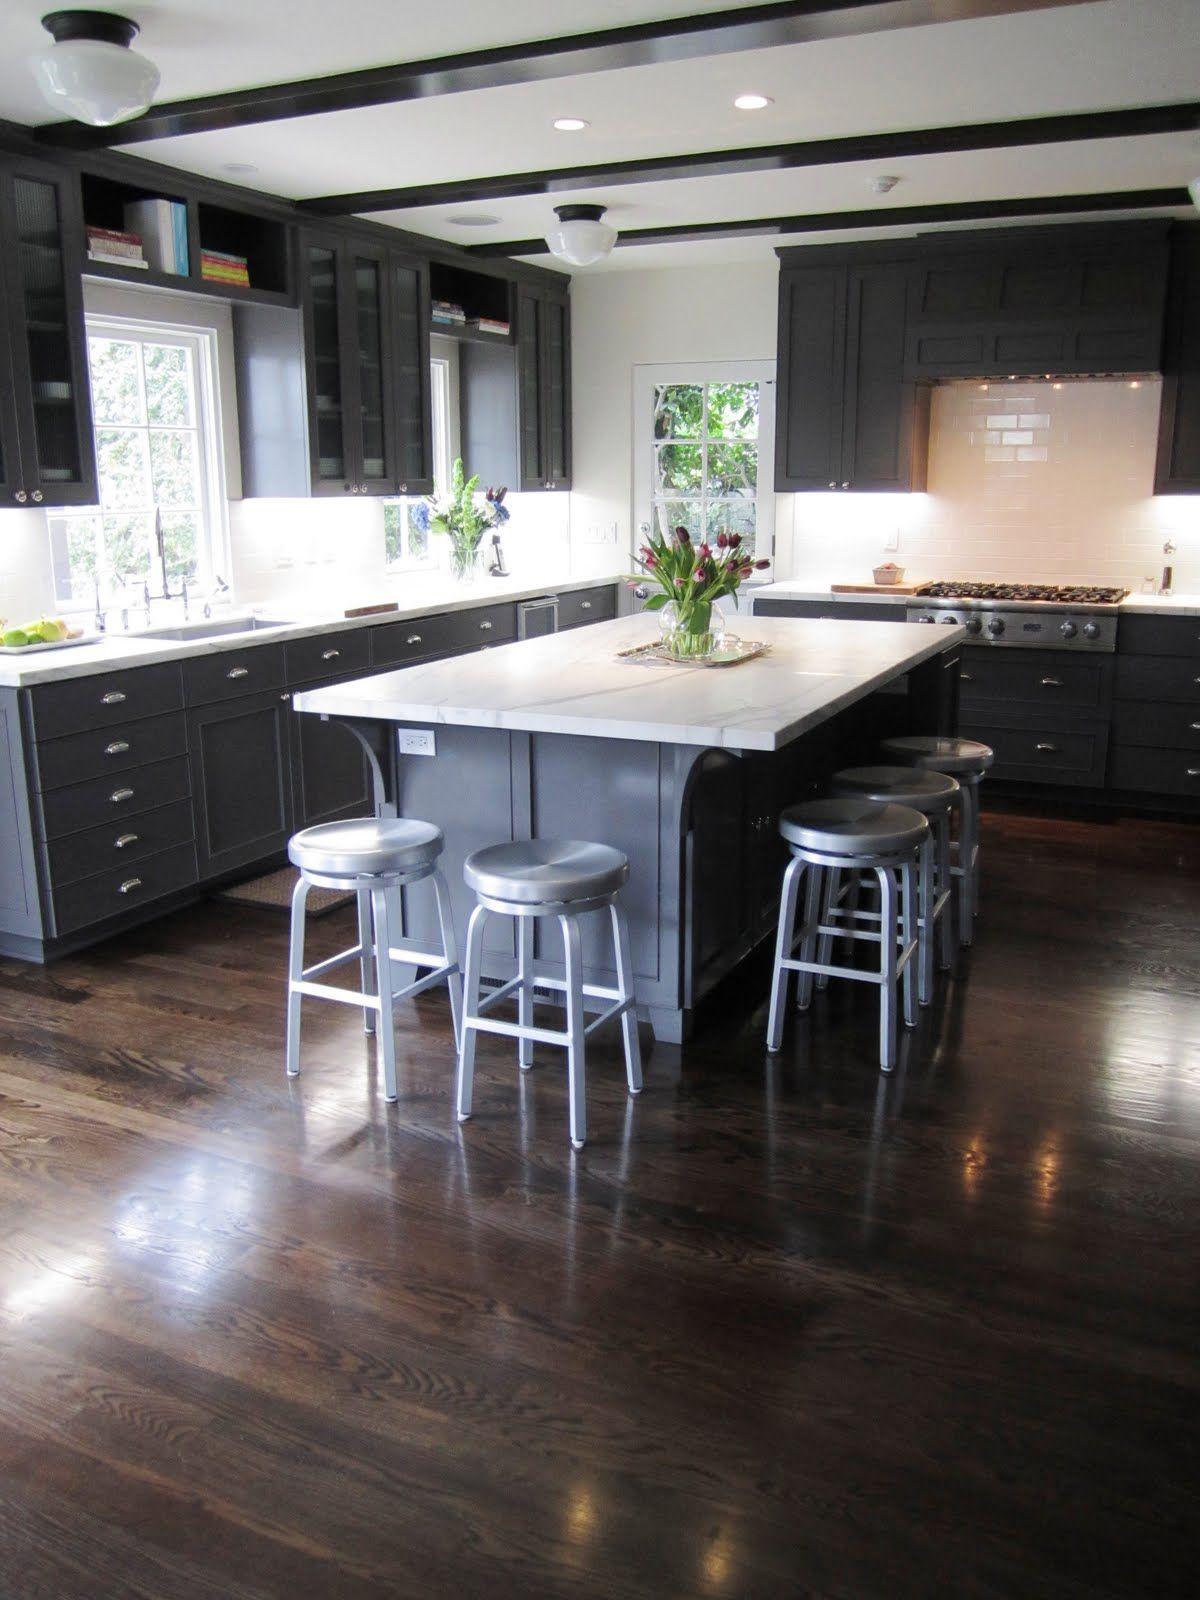 Küchenideen ahornschränke thin celing beams in kitchen  cococozy cococozy exclusive kitchen